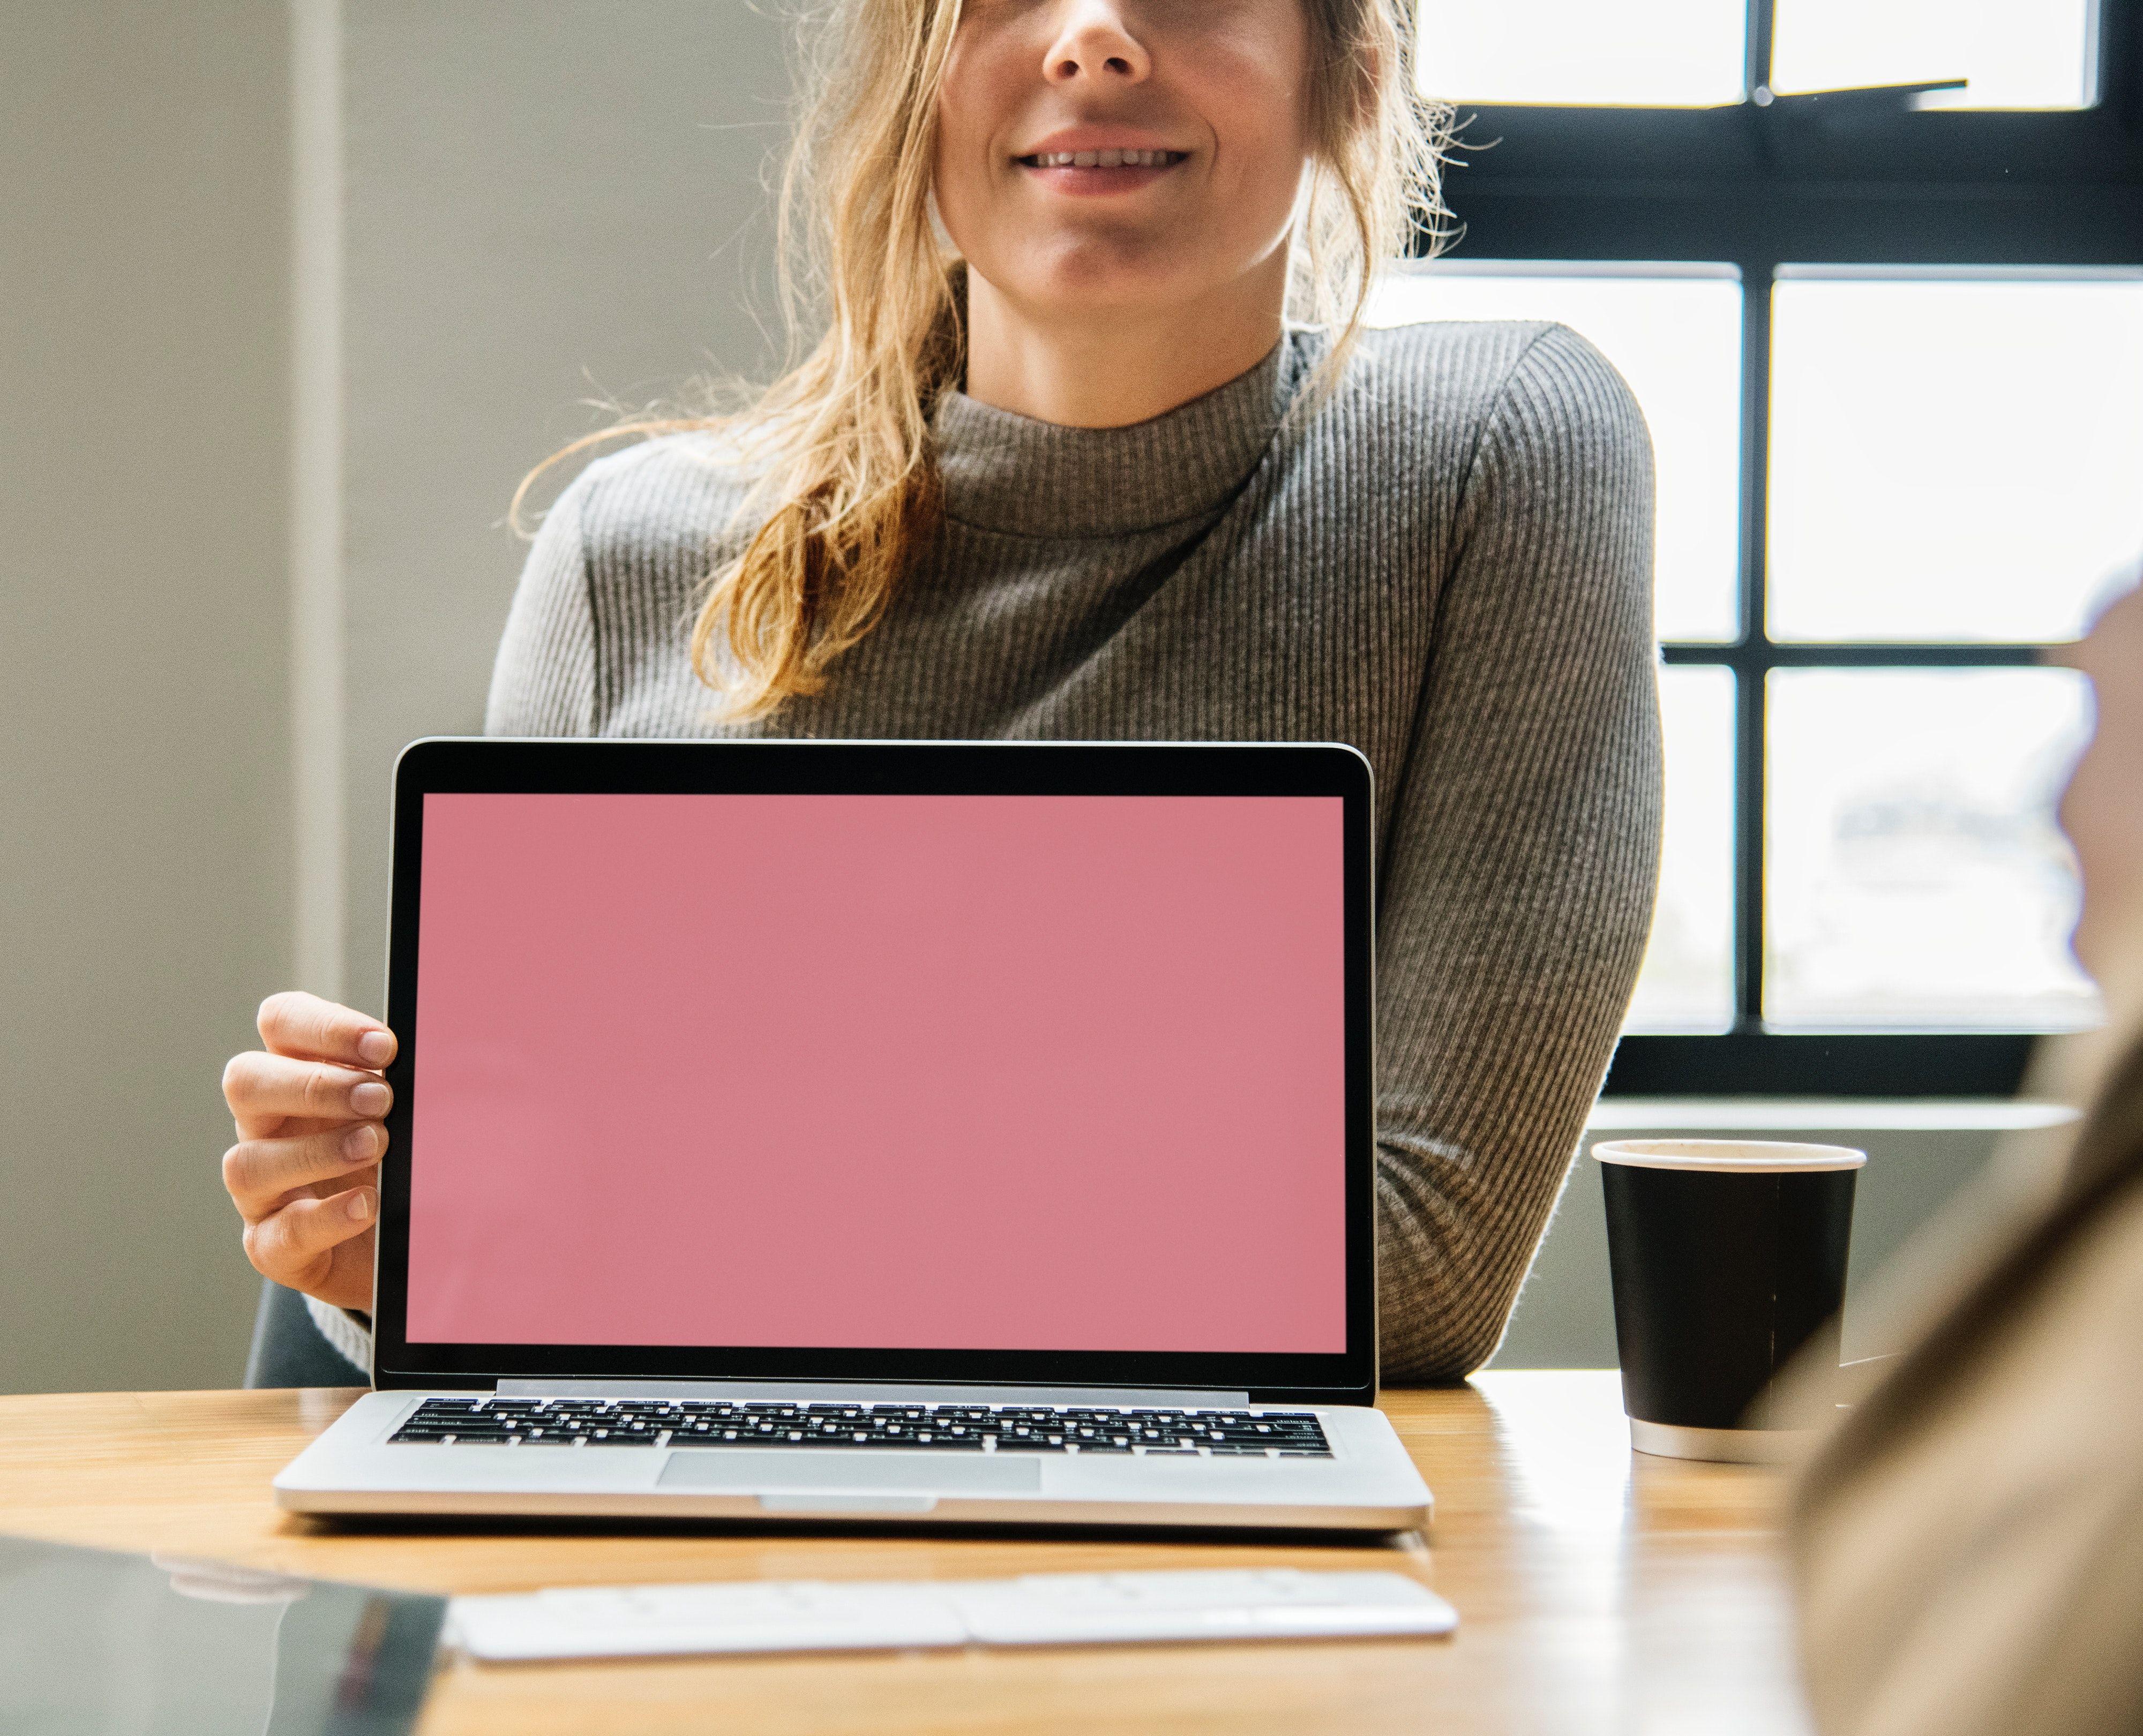 Best Laptops 2018 Best Laptops 2018 Uk Best Laptop Brand Best Laptop For Gaming Under 500 Best G Digital Marketing Training Marketing Courses Web Banner Design